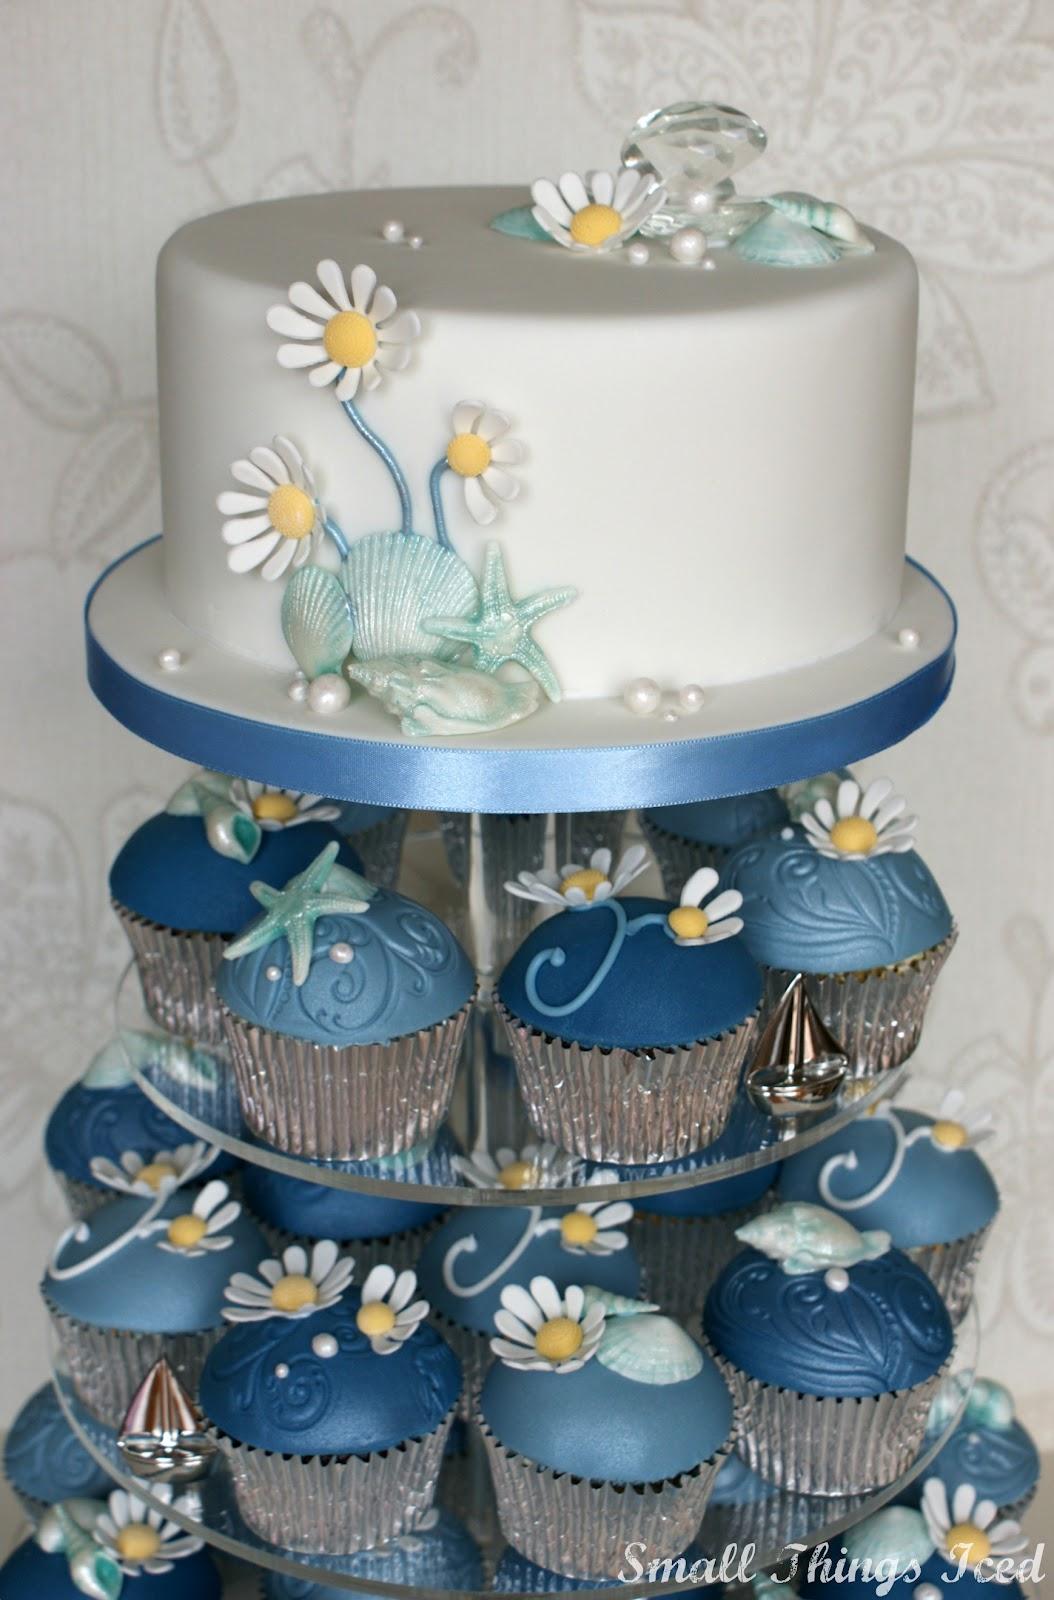 Small Things Iced Daisy & Sea Shell Cupcake Tower 2